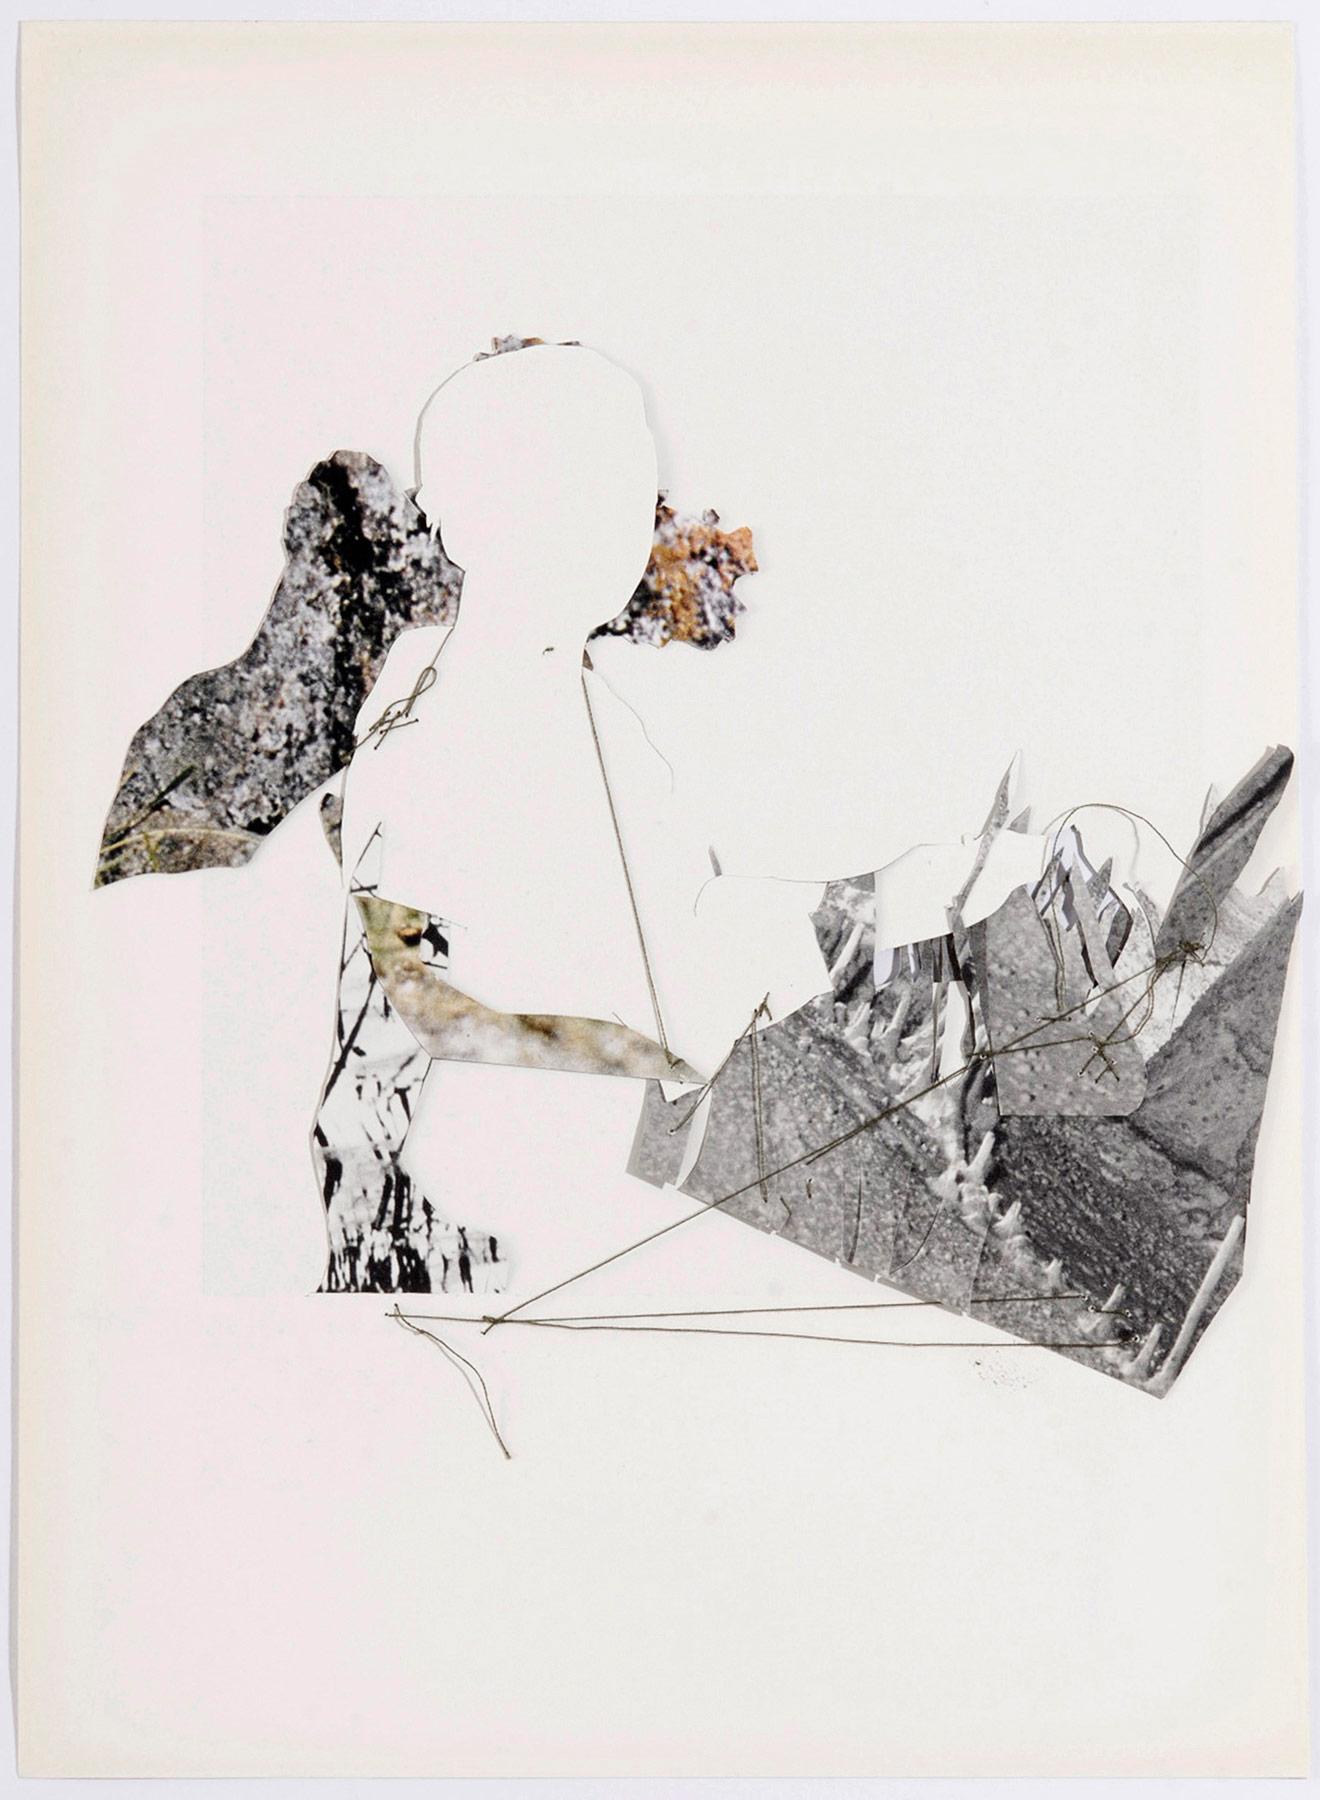 Collage#26, 2010. (Dorso). Collage,papel, hilo. 25 x 19,5 cm.